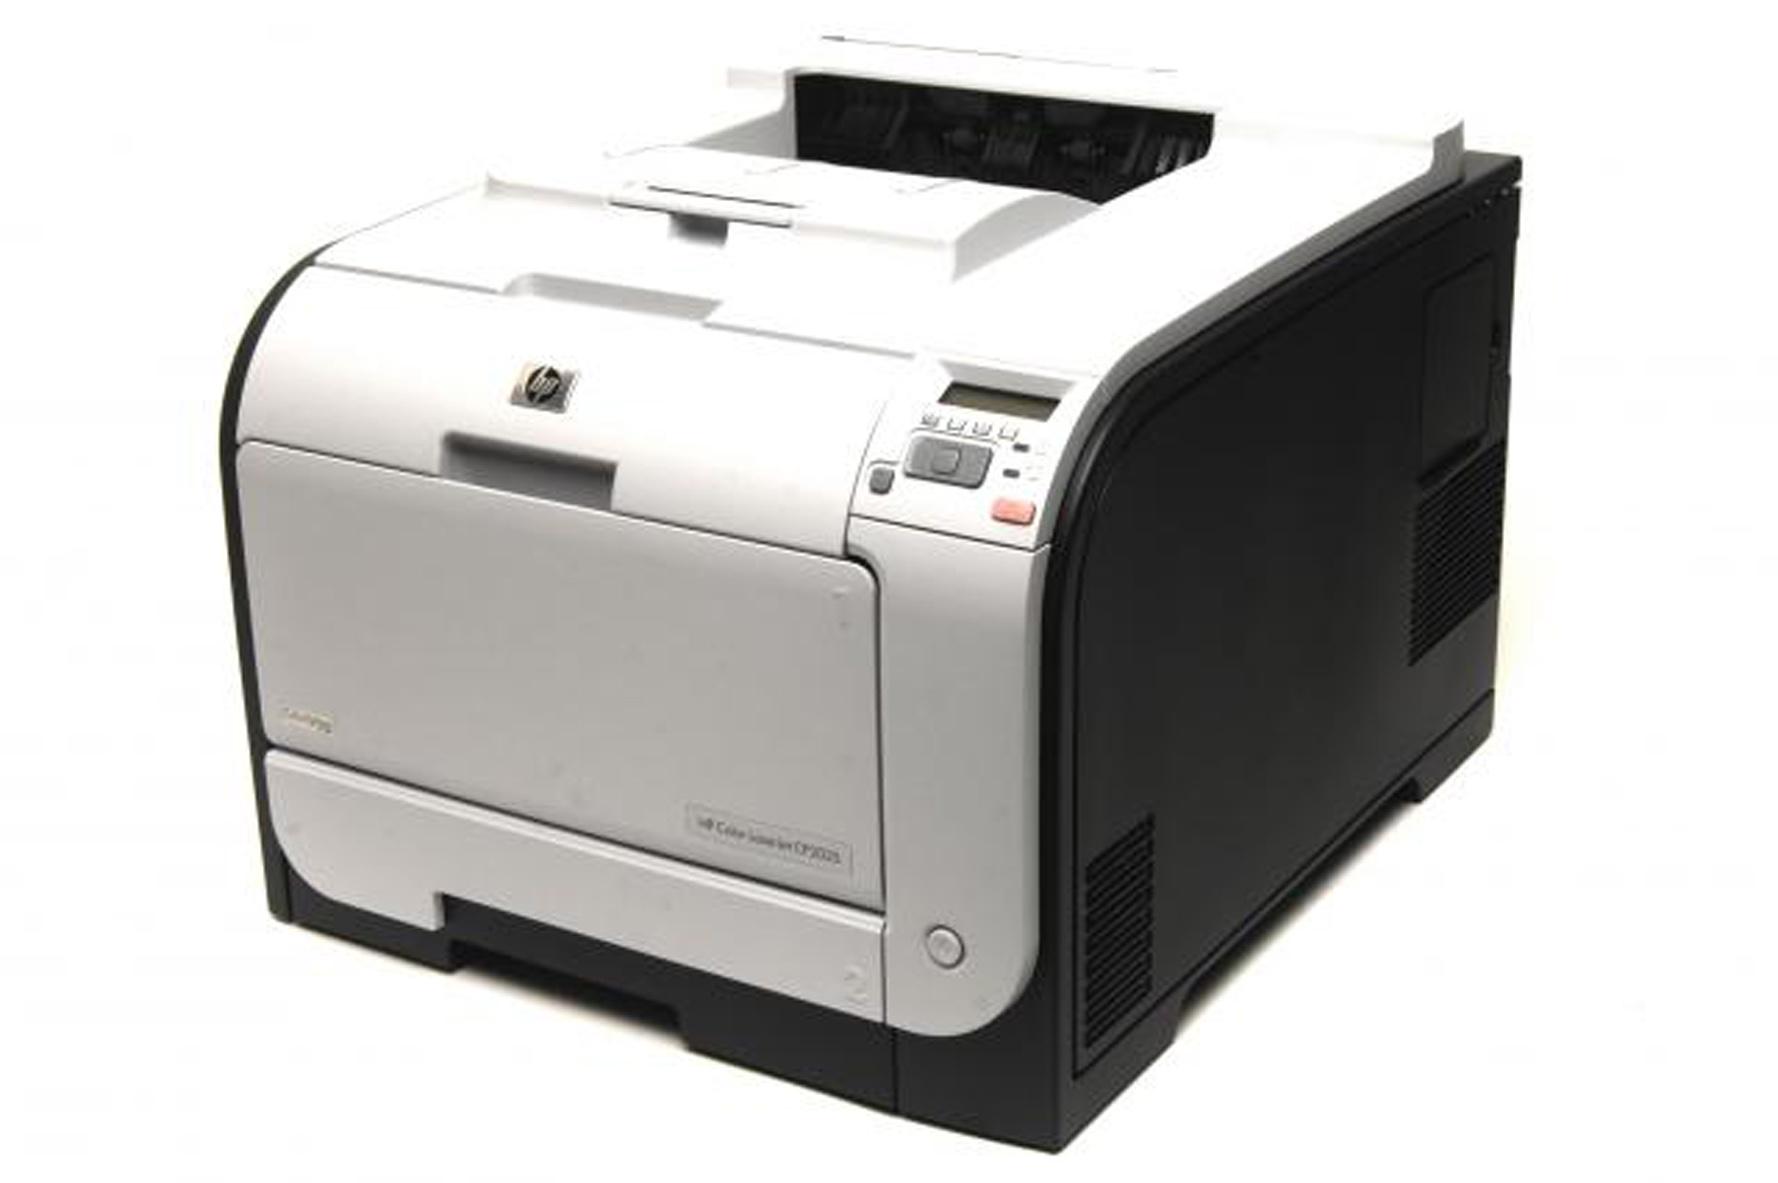 HP Color LaserJet CP 2020 Series